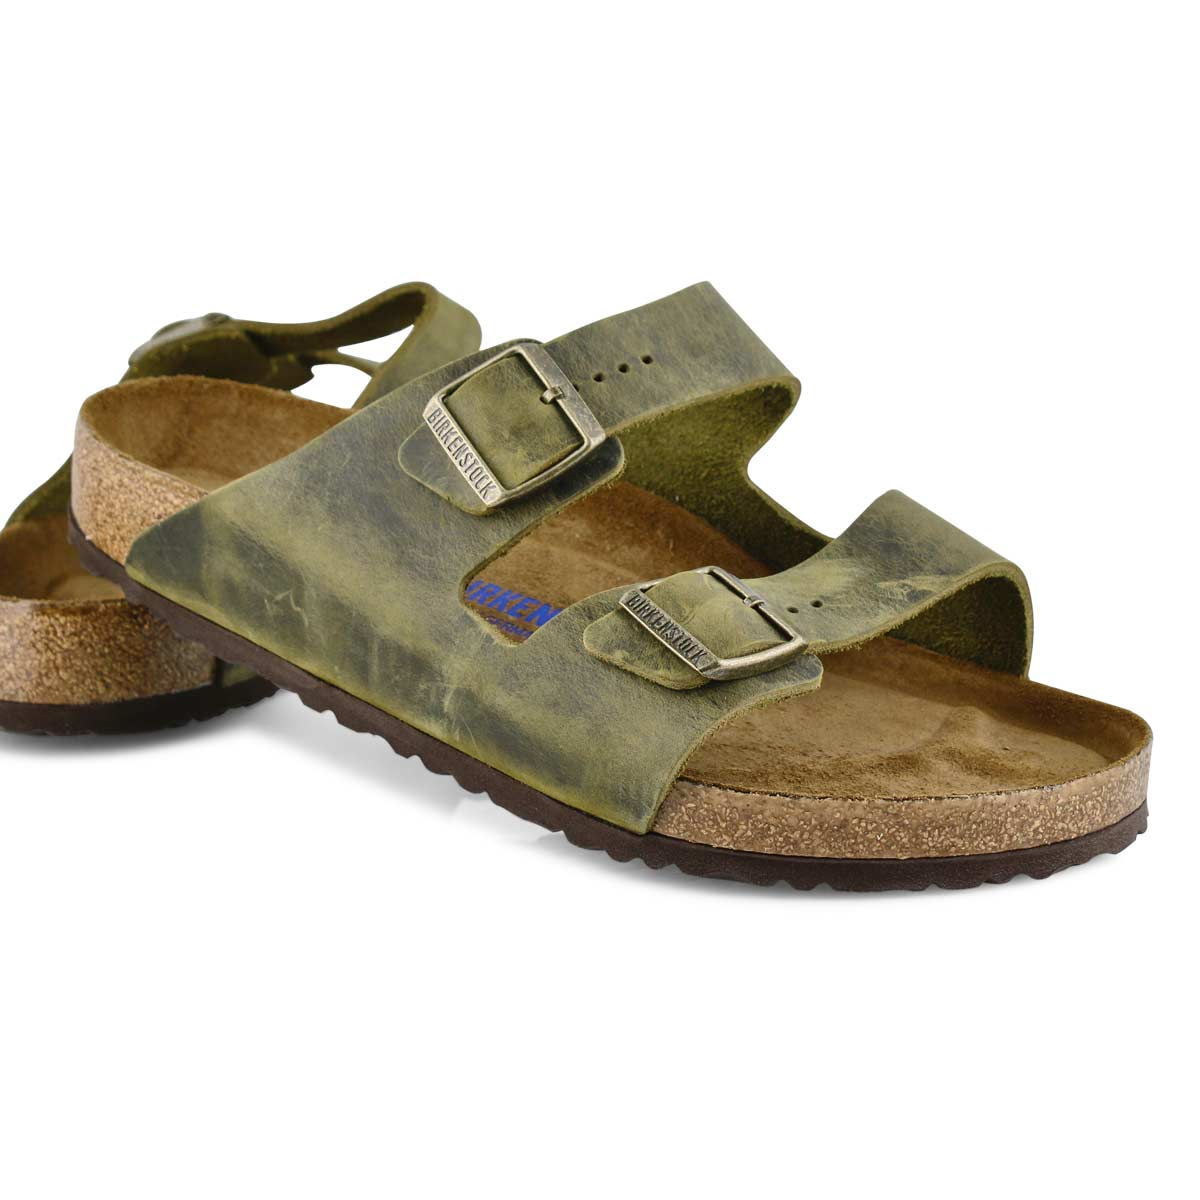 Mns Arizona SF jade 2 strap sandal